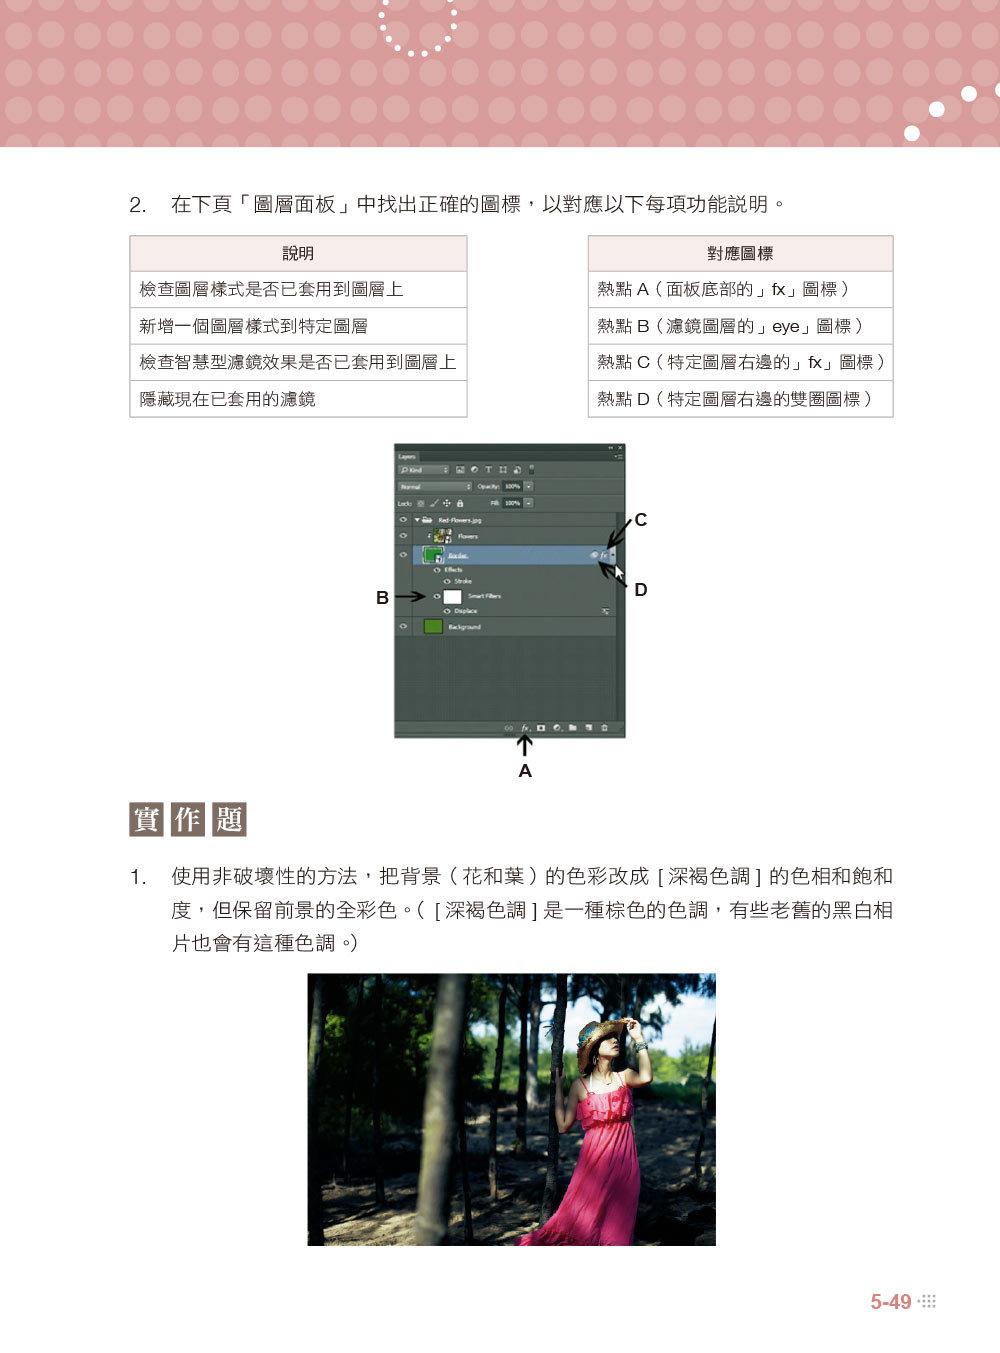 Photoshop CC 影像編修與視覺設計 (含ACA-Photoshop CC國際認證完全模擬與解題)-preview-15